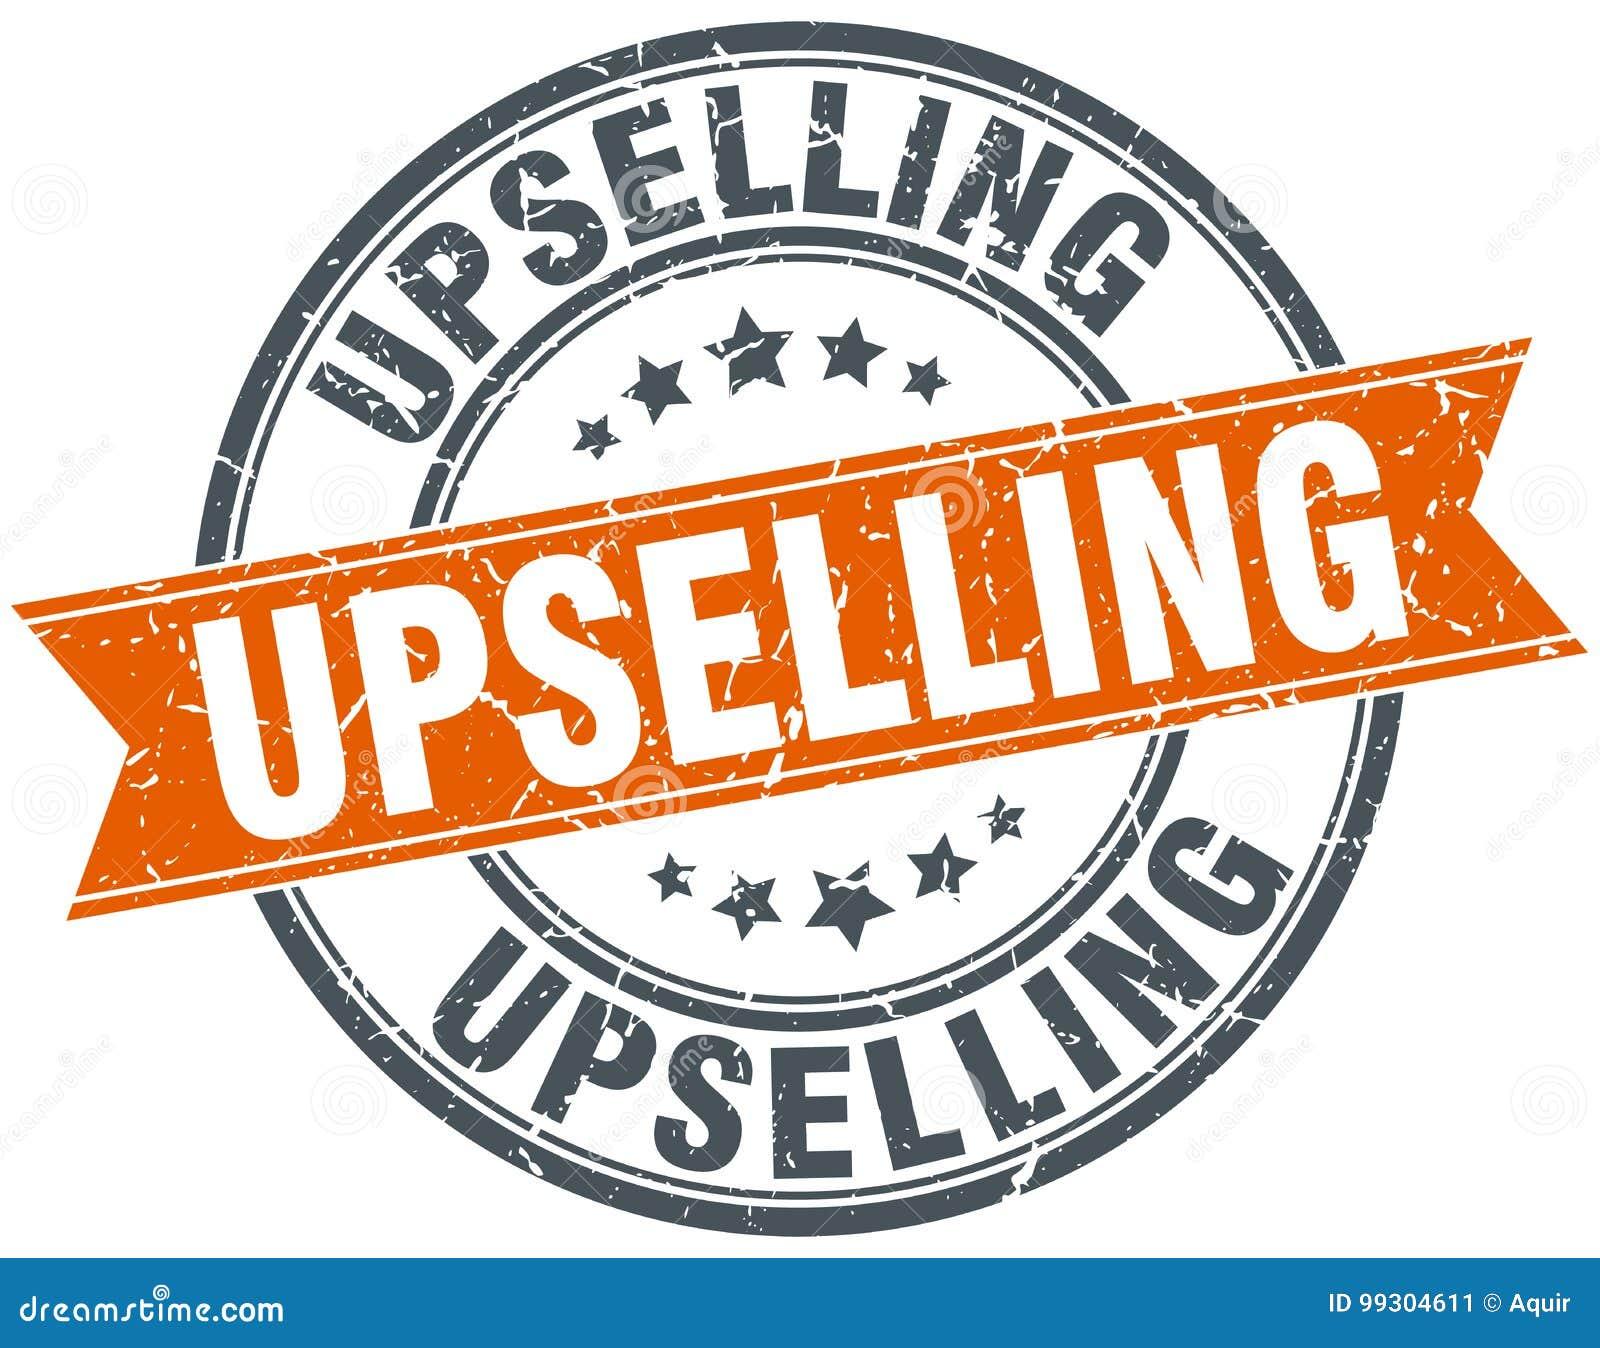 Upselling Stock Illustrations – 78 Upselling Stock ...